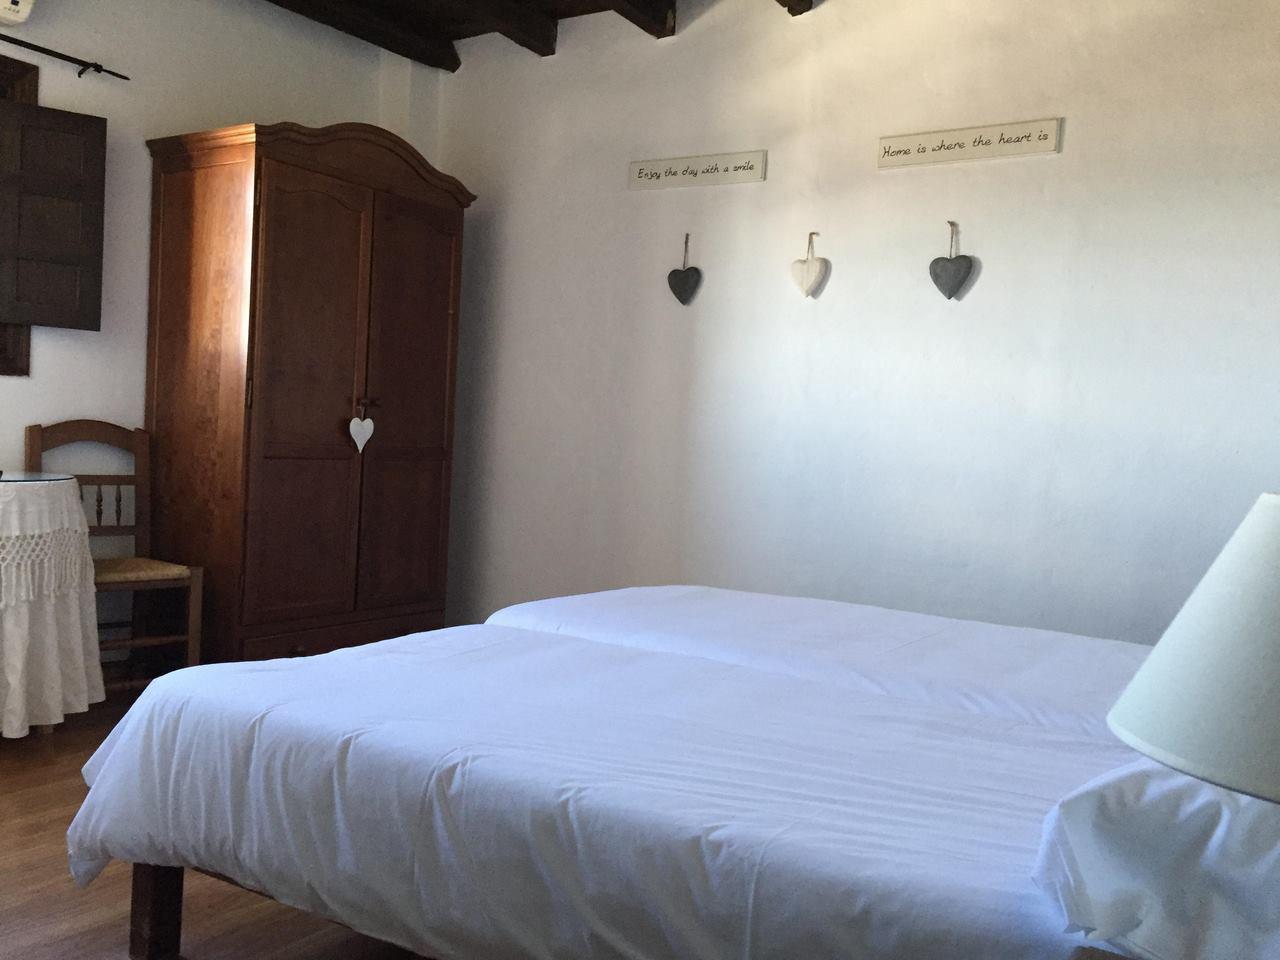 Apartamentos en alquiler Benaocaz, Cádiz